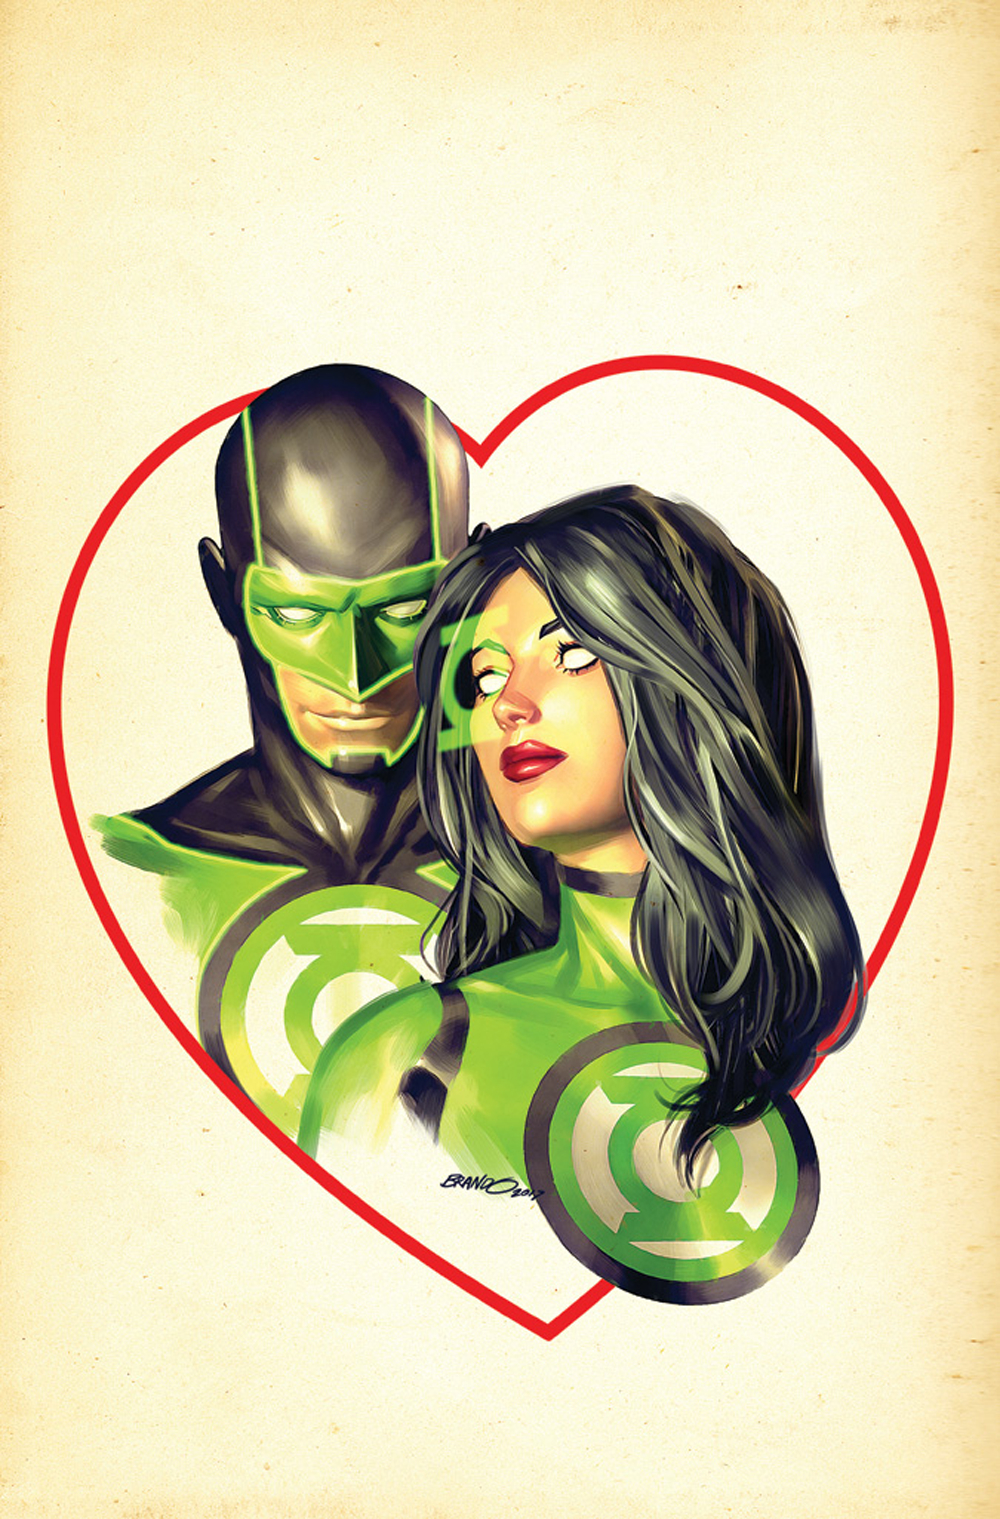 Green Lanterns Vol 1 39 Variant 2 Textless.jpg